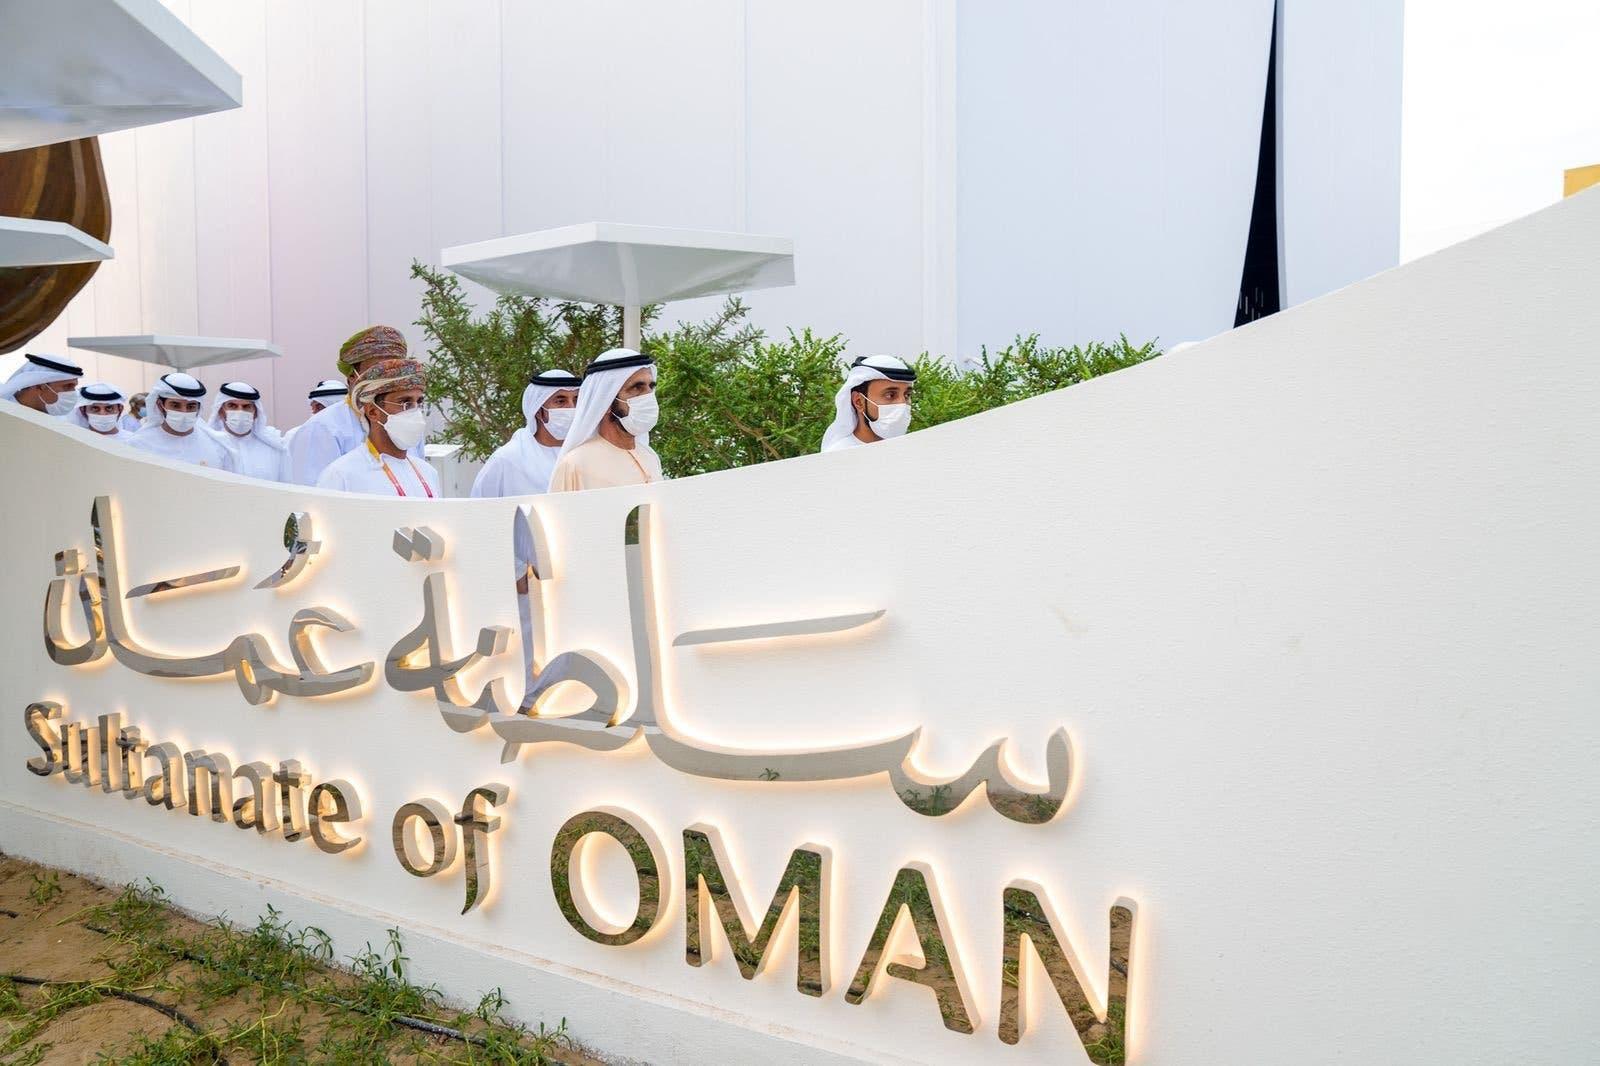 Sheikh Mohammed bin Rashid Al Maktoum visits Oman's pavillion at Expo 2020 Dubai.1 (Twitter)